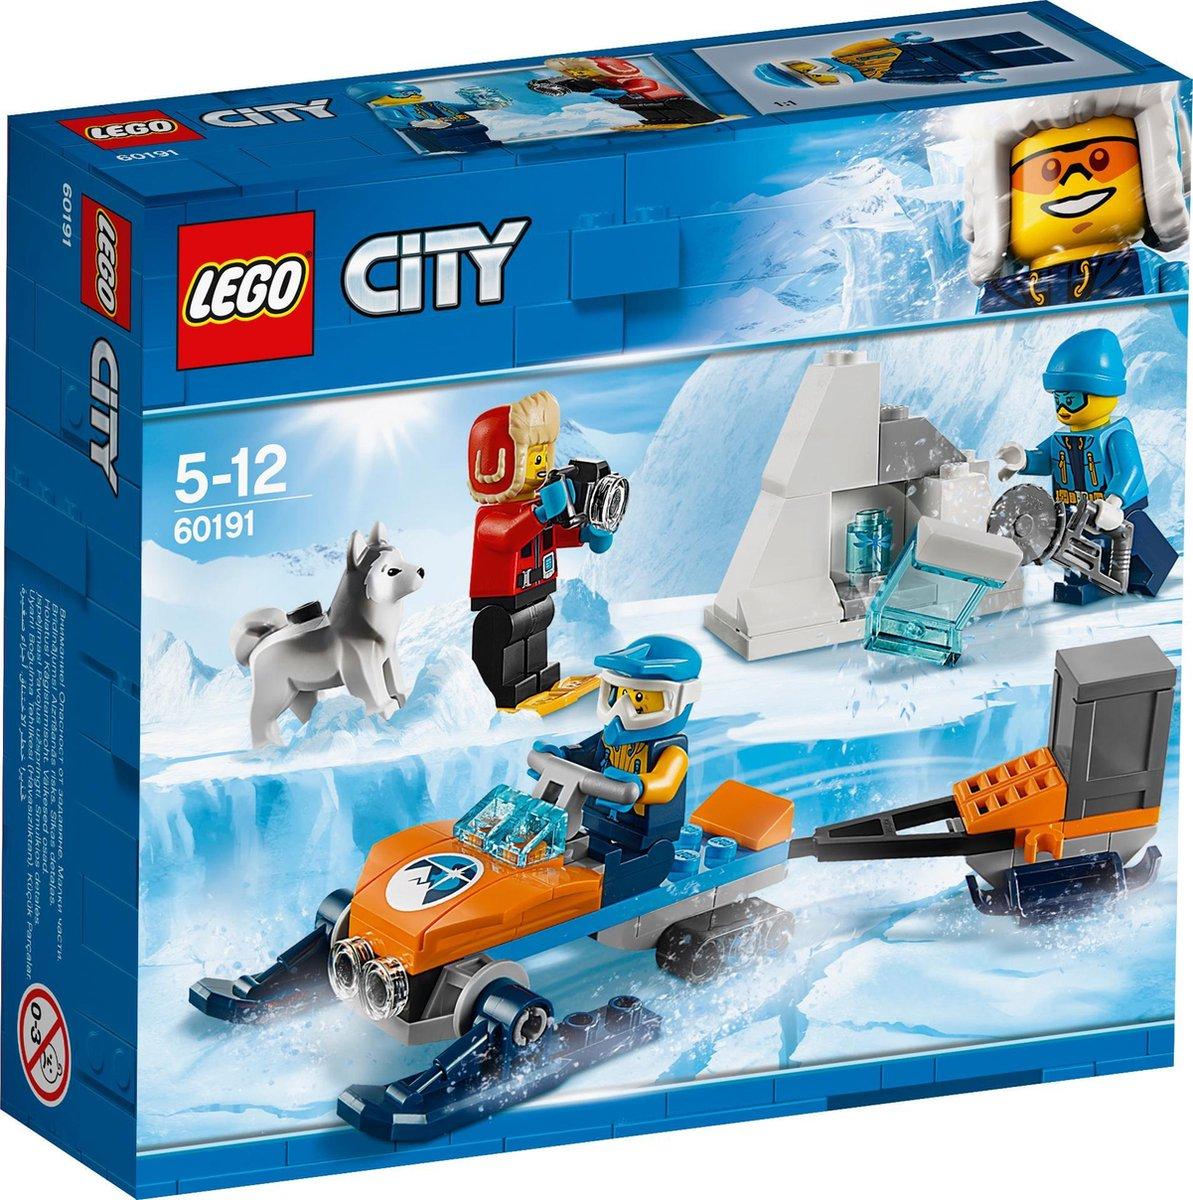 LEGO City 60191 - Poolonderzoekersteam